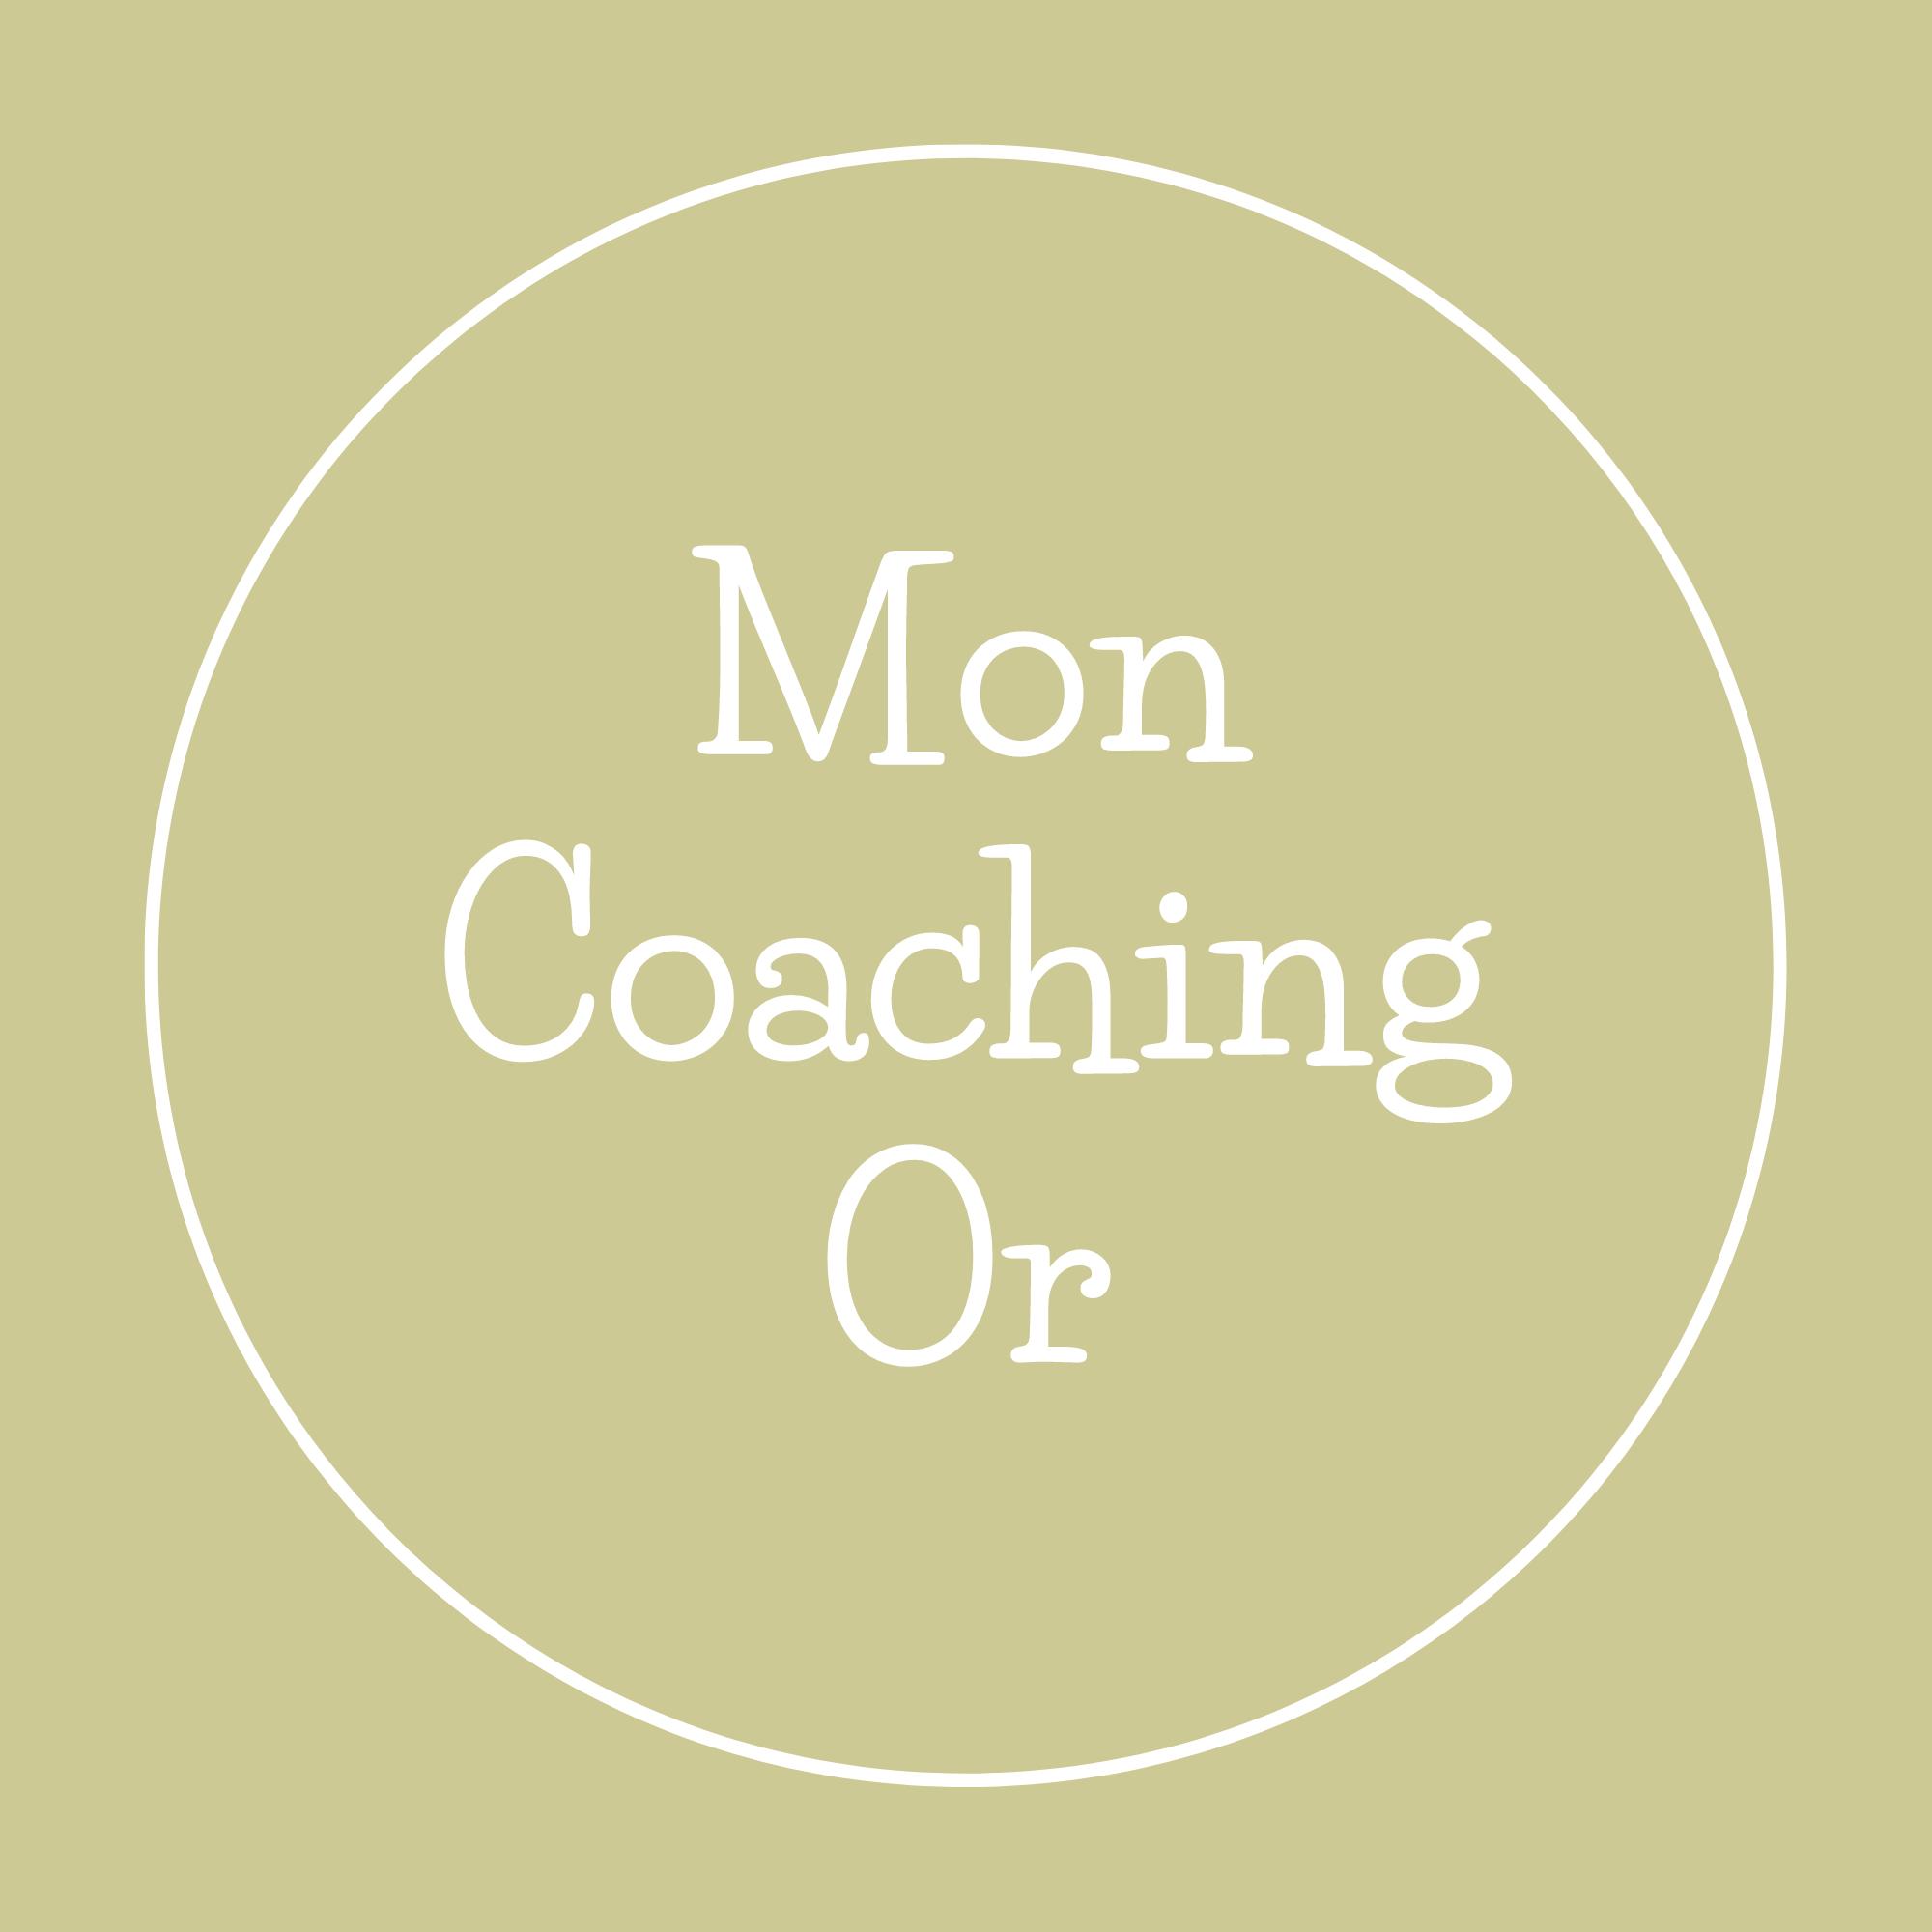 Mon Coaching Or